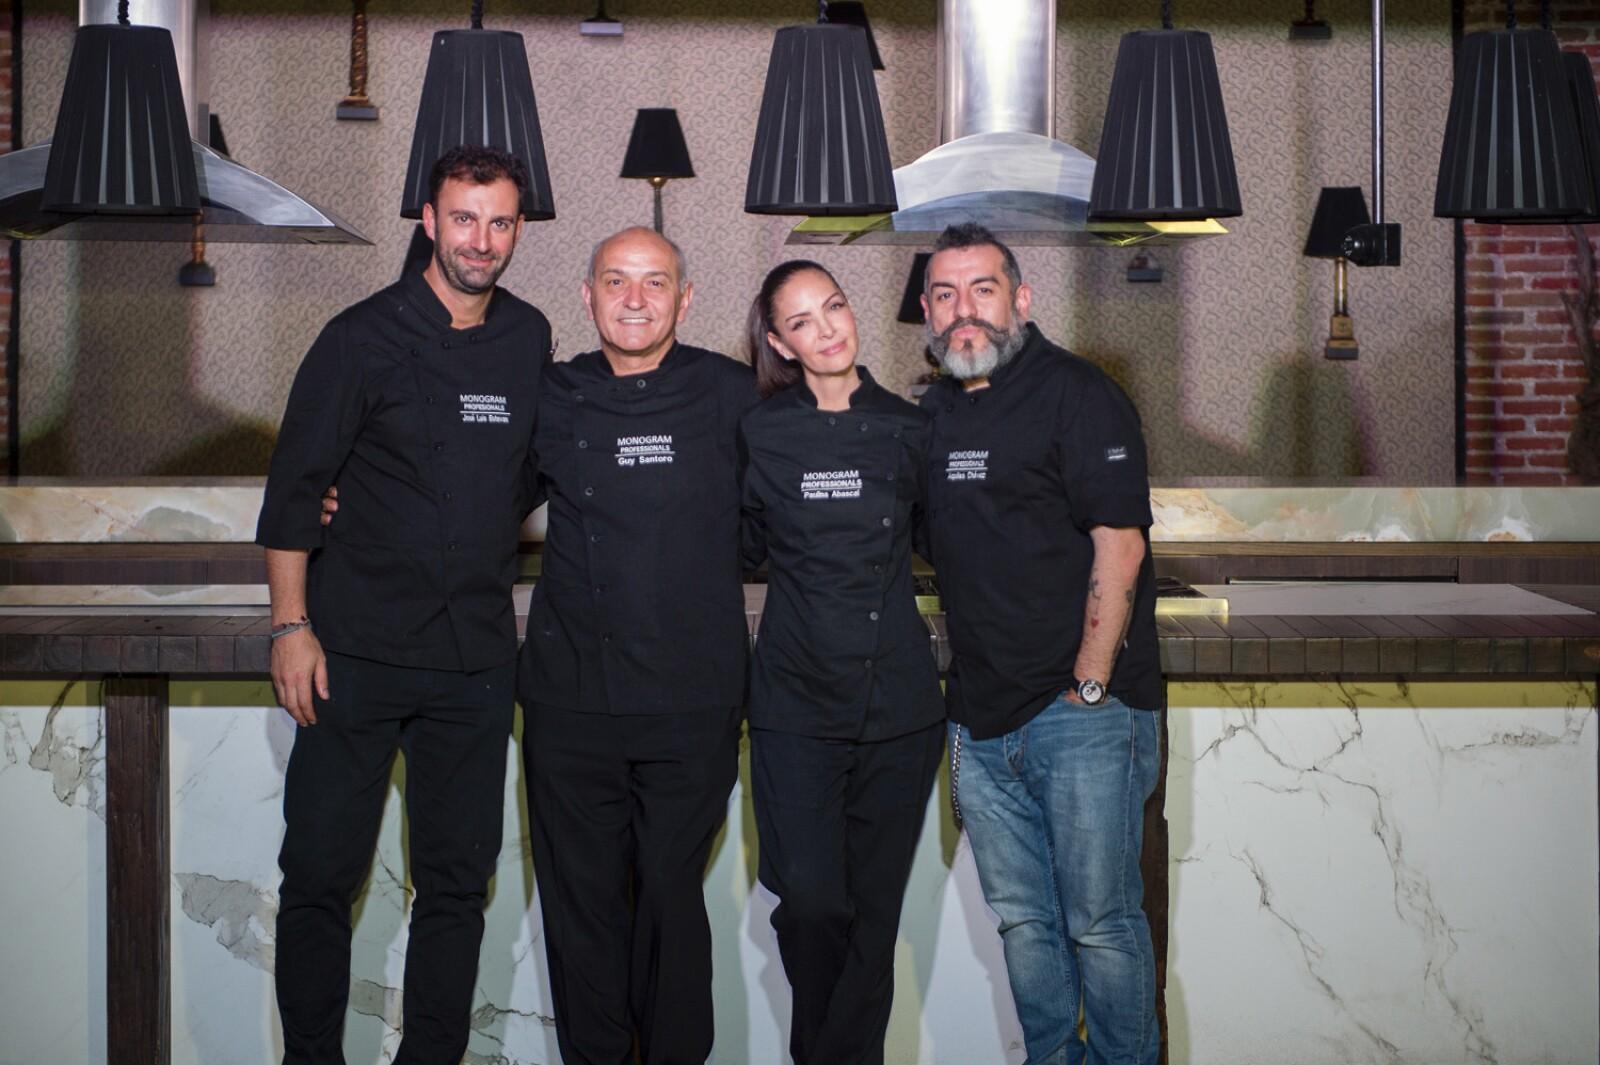 Jose Luis Estevan, Guy Santoro, Paulina Abascal, Aquiles Chavez.jpg